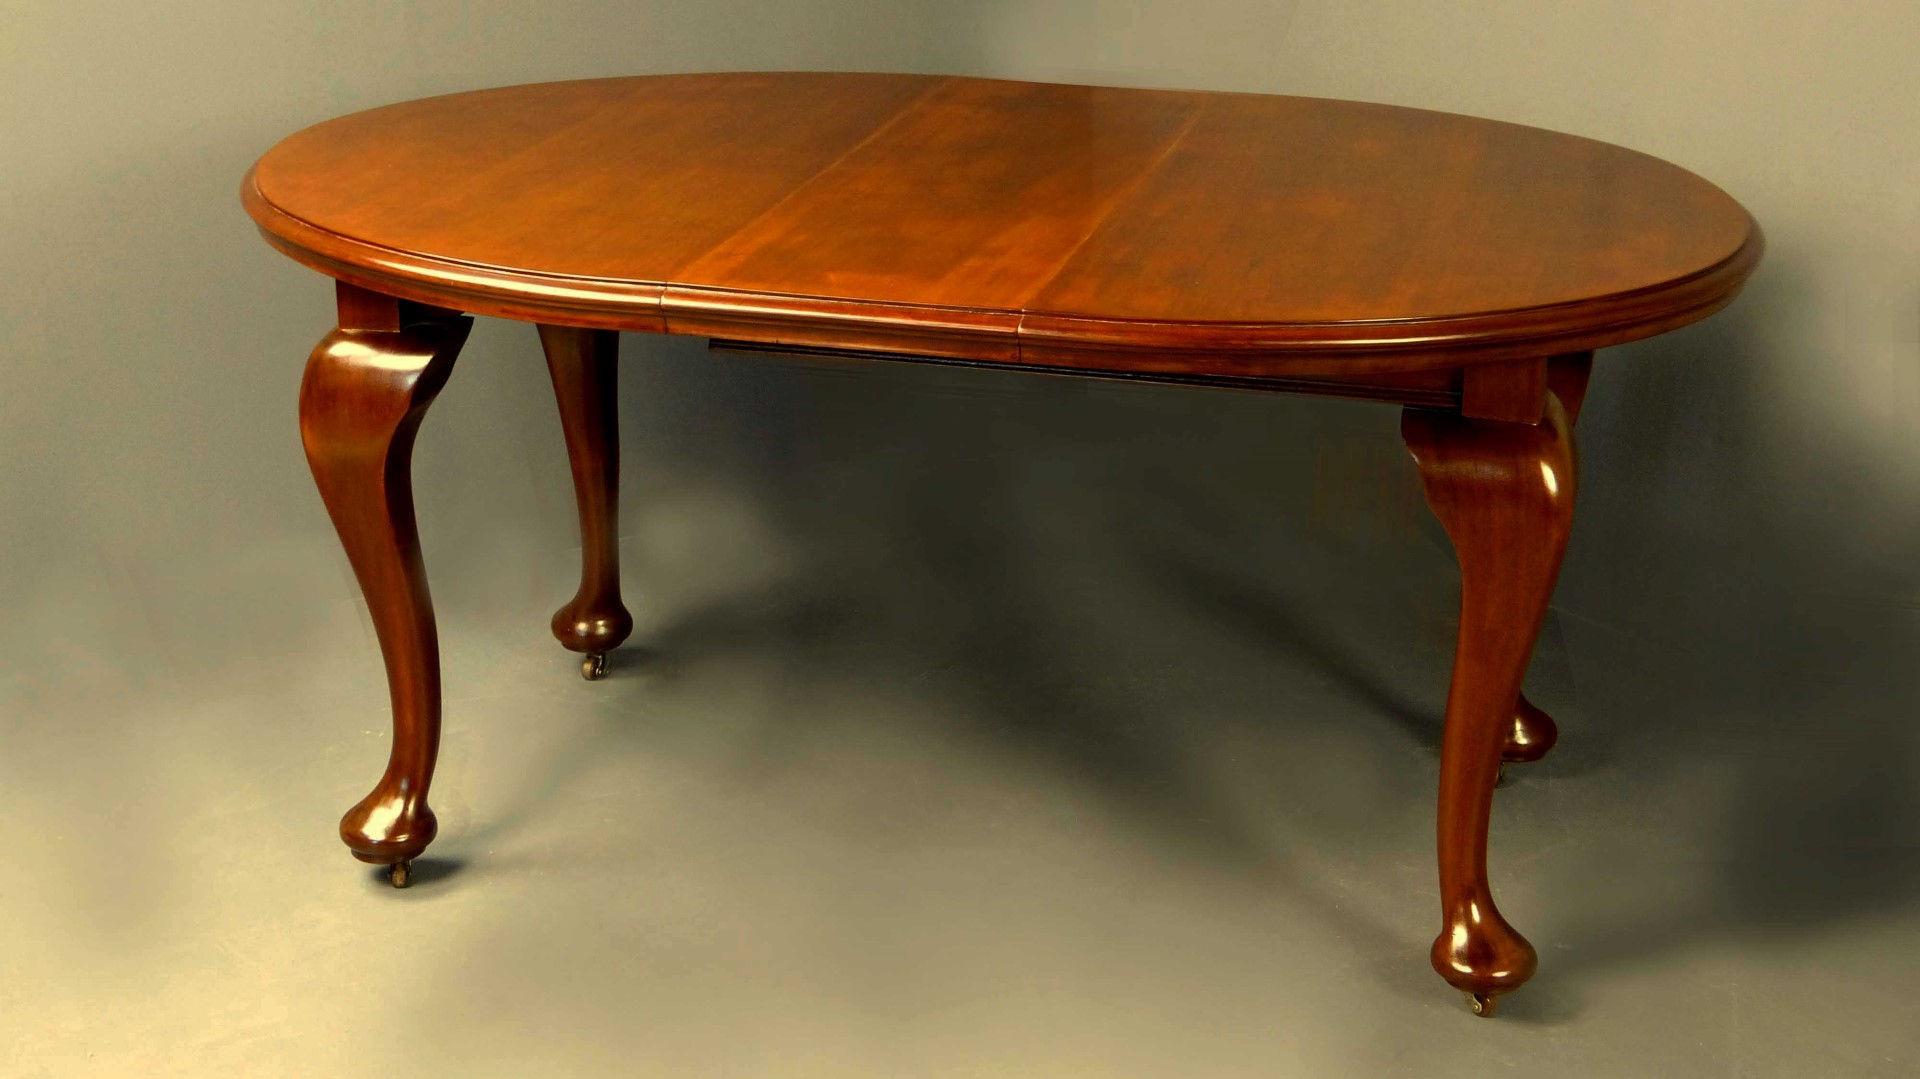 Muebles antiguos armarios antiguos mesas antiguas - Mesas de comedor antiguas restauradas ...